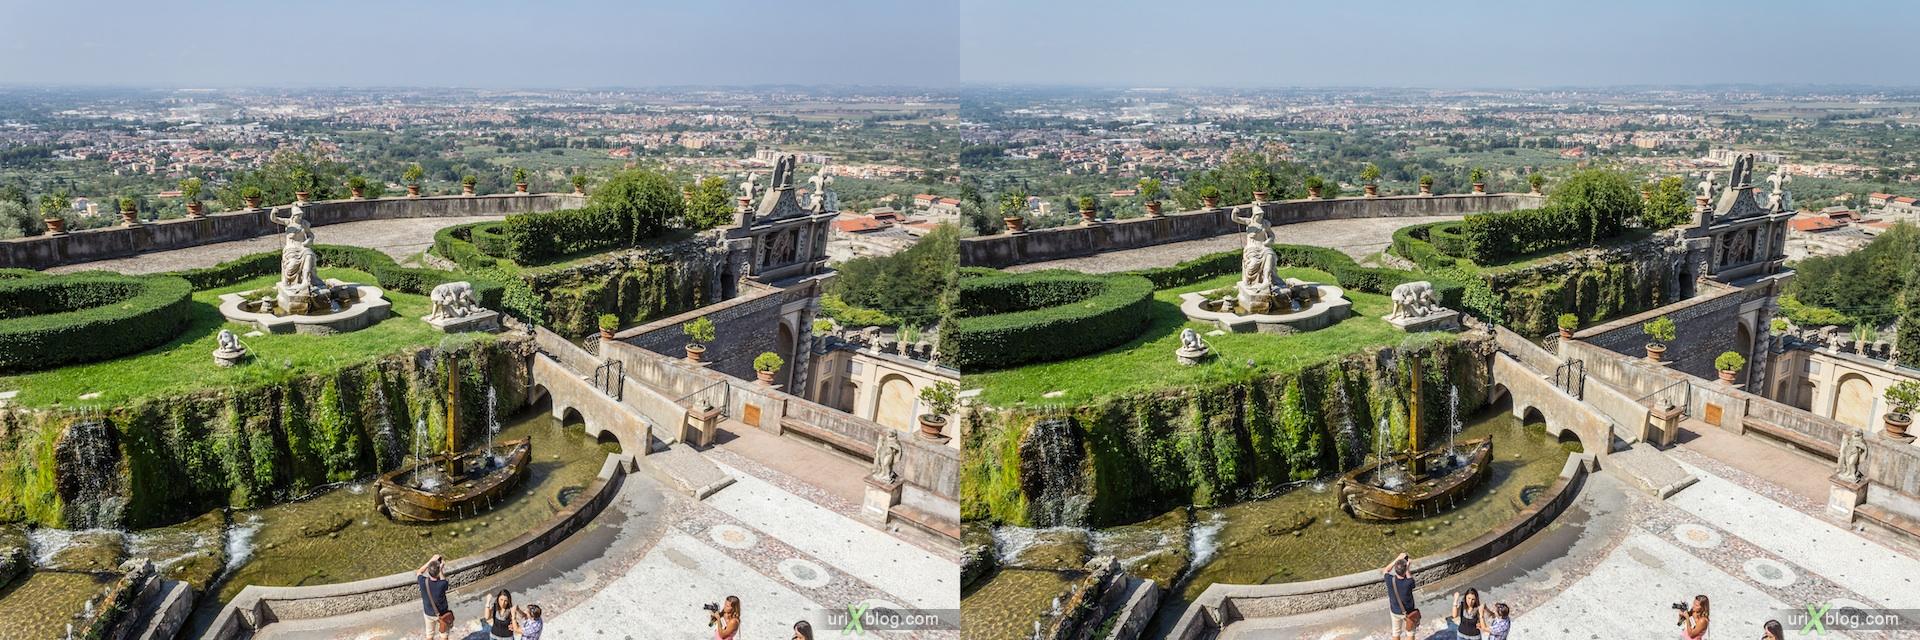 2012, Fontana della Rometta, villa D'Este, Italy, Tivoli, Rome, 3D, stereo pair, cross-eyed, crossview, cross view stereo pair